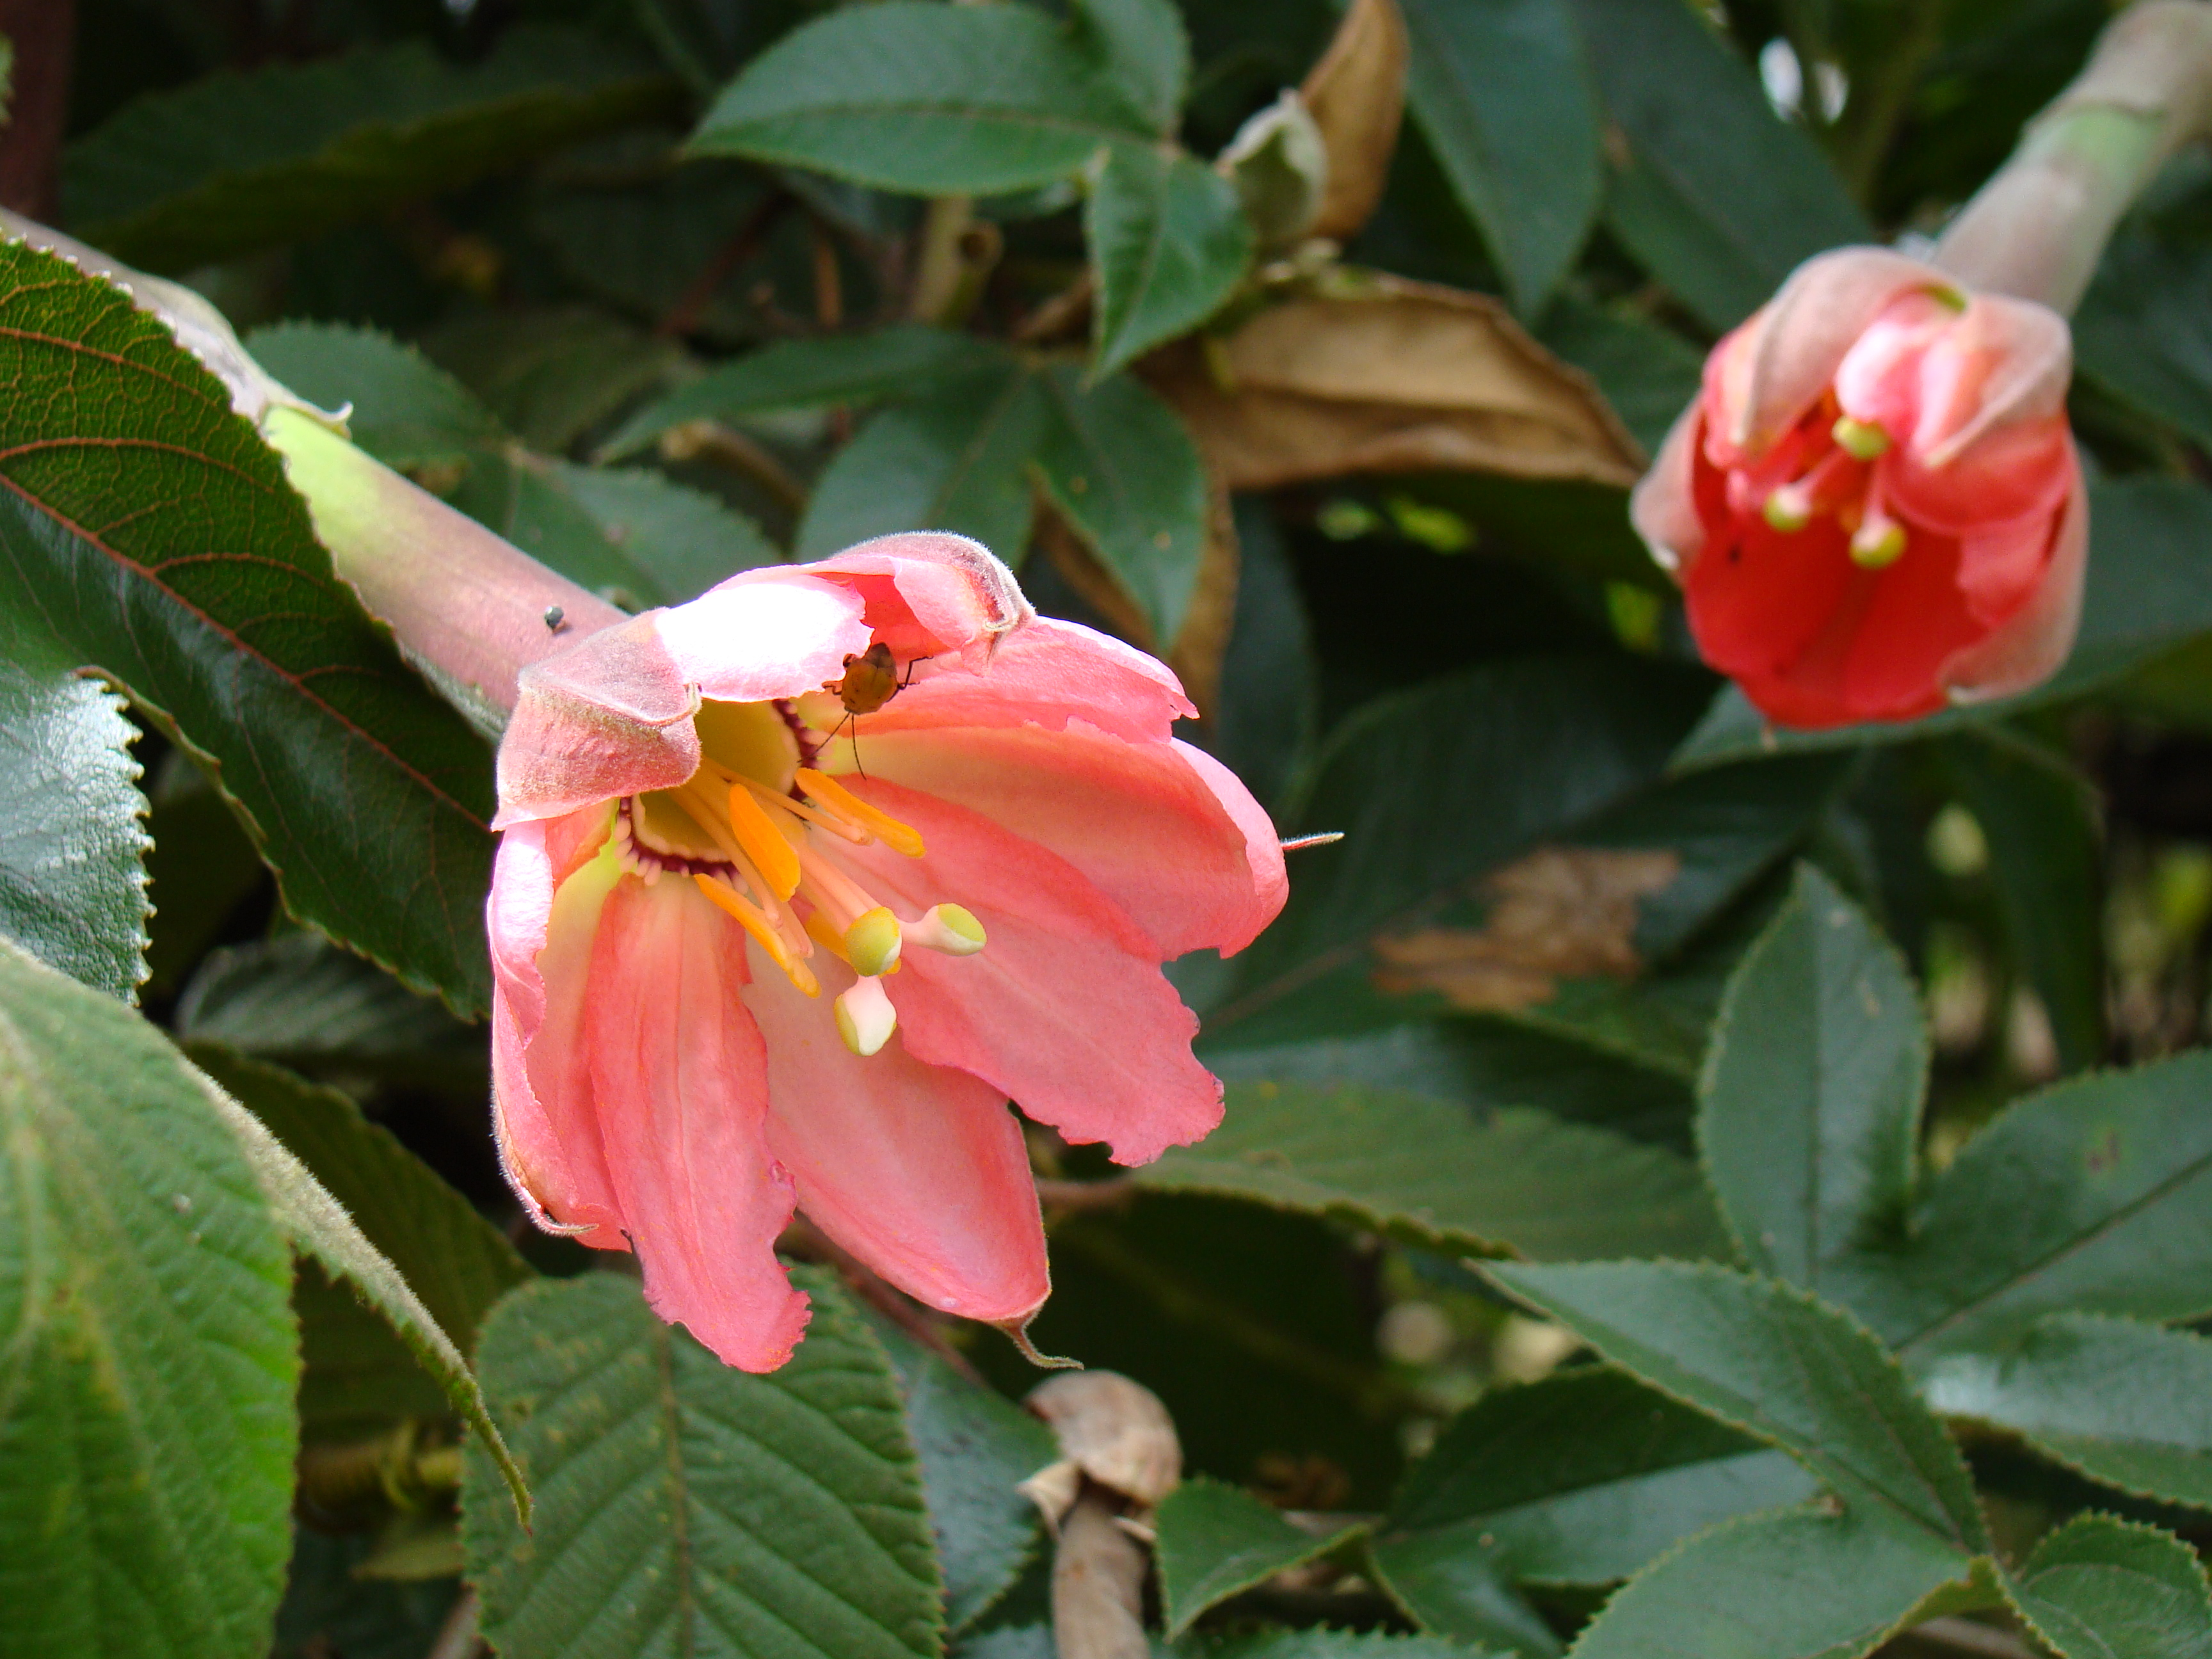 Passiflora molissimа